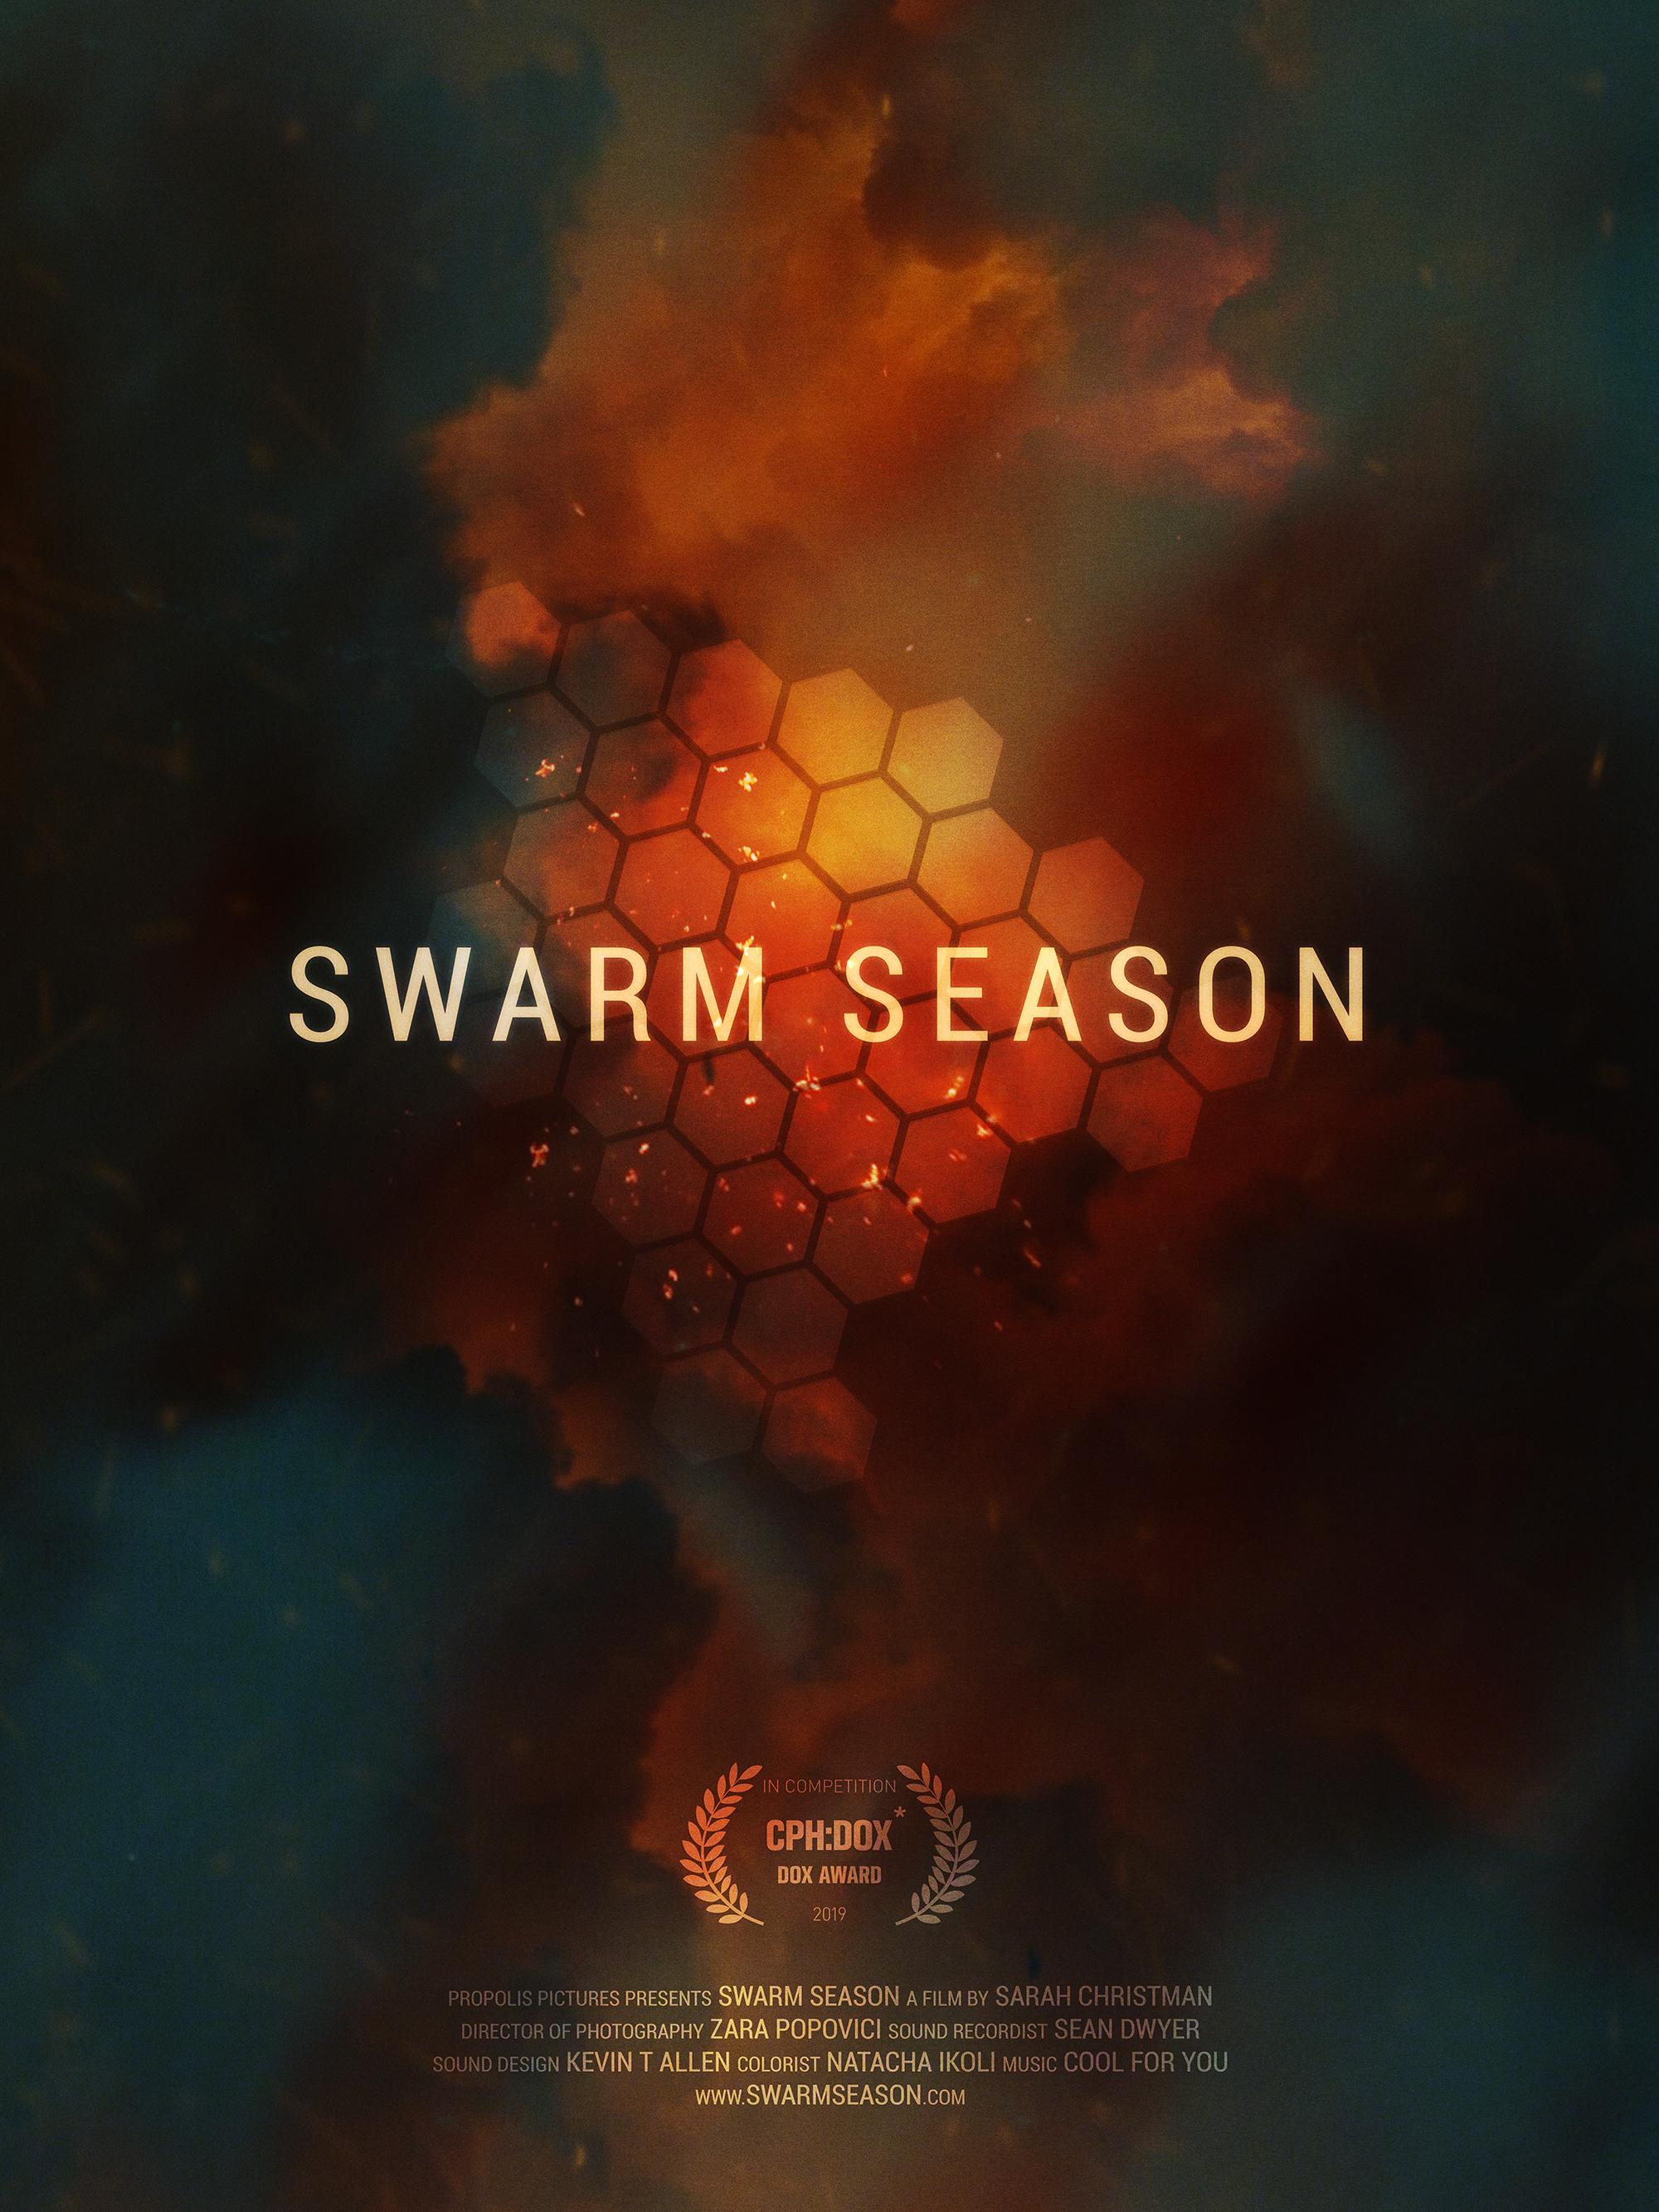 swarm_season_poster_thumb.jpg